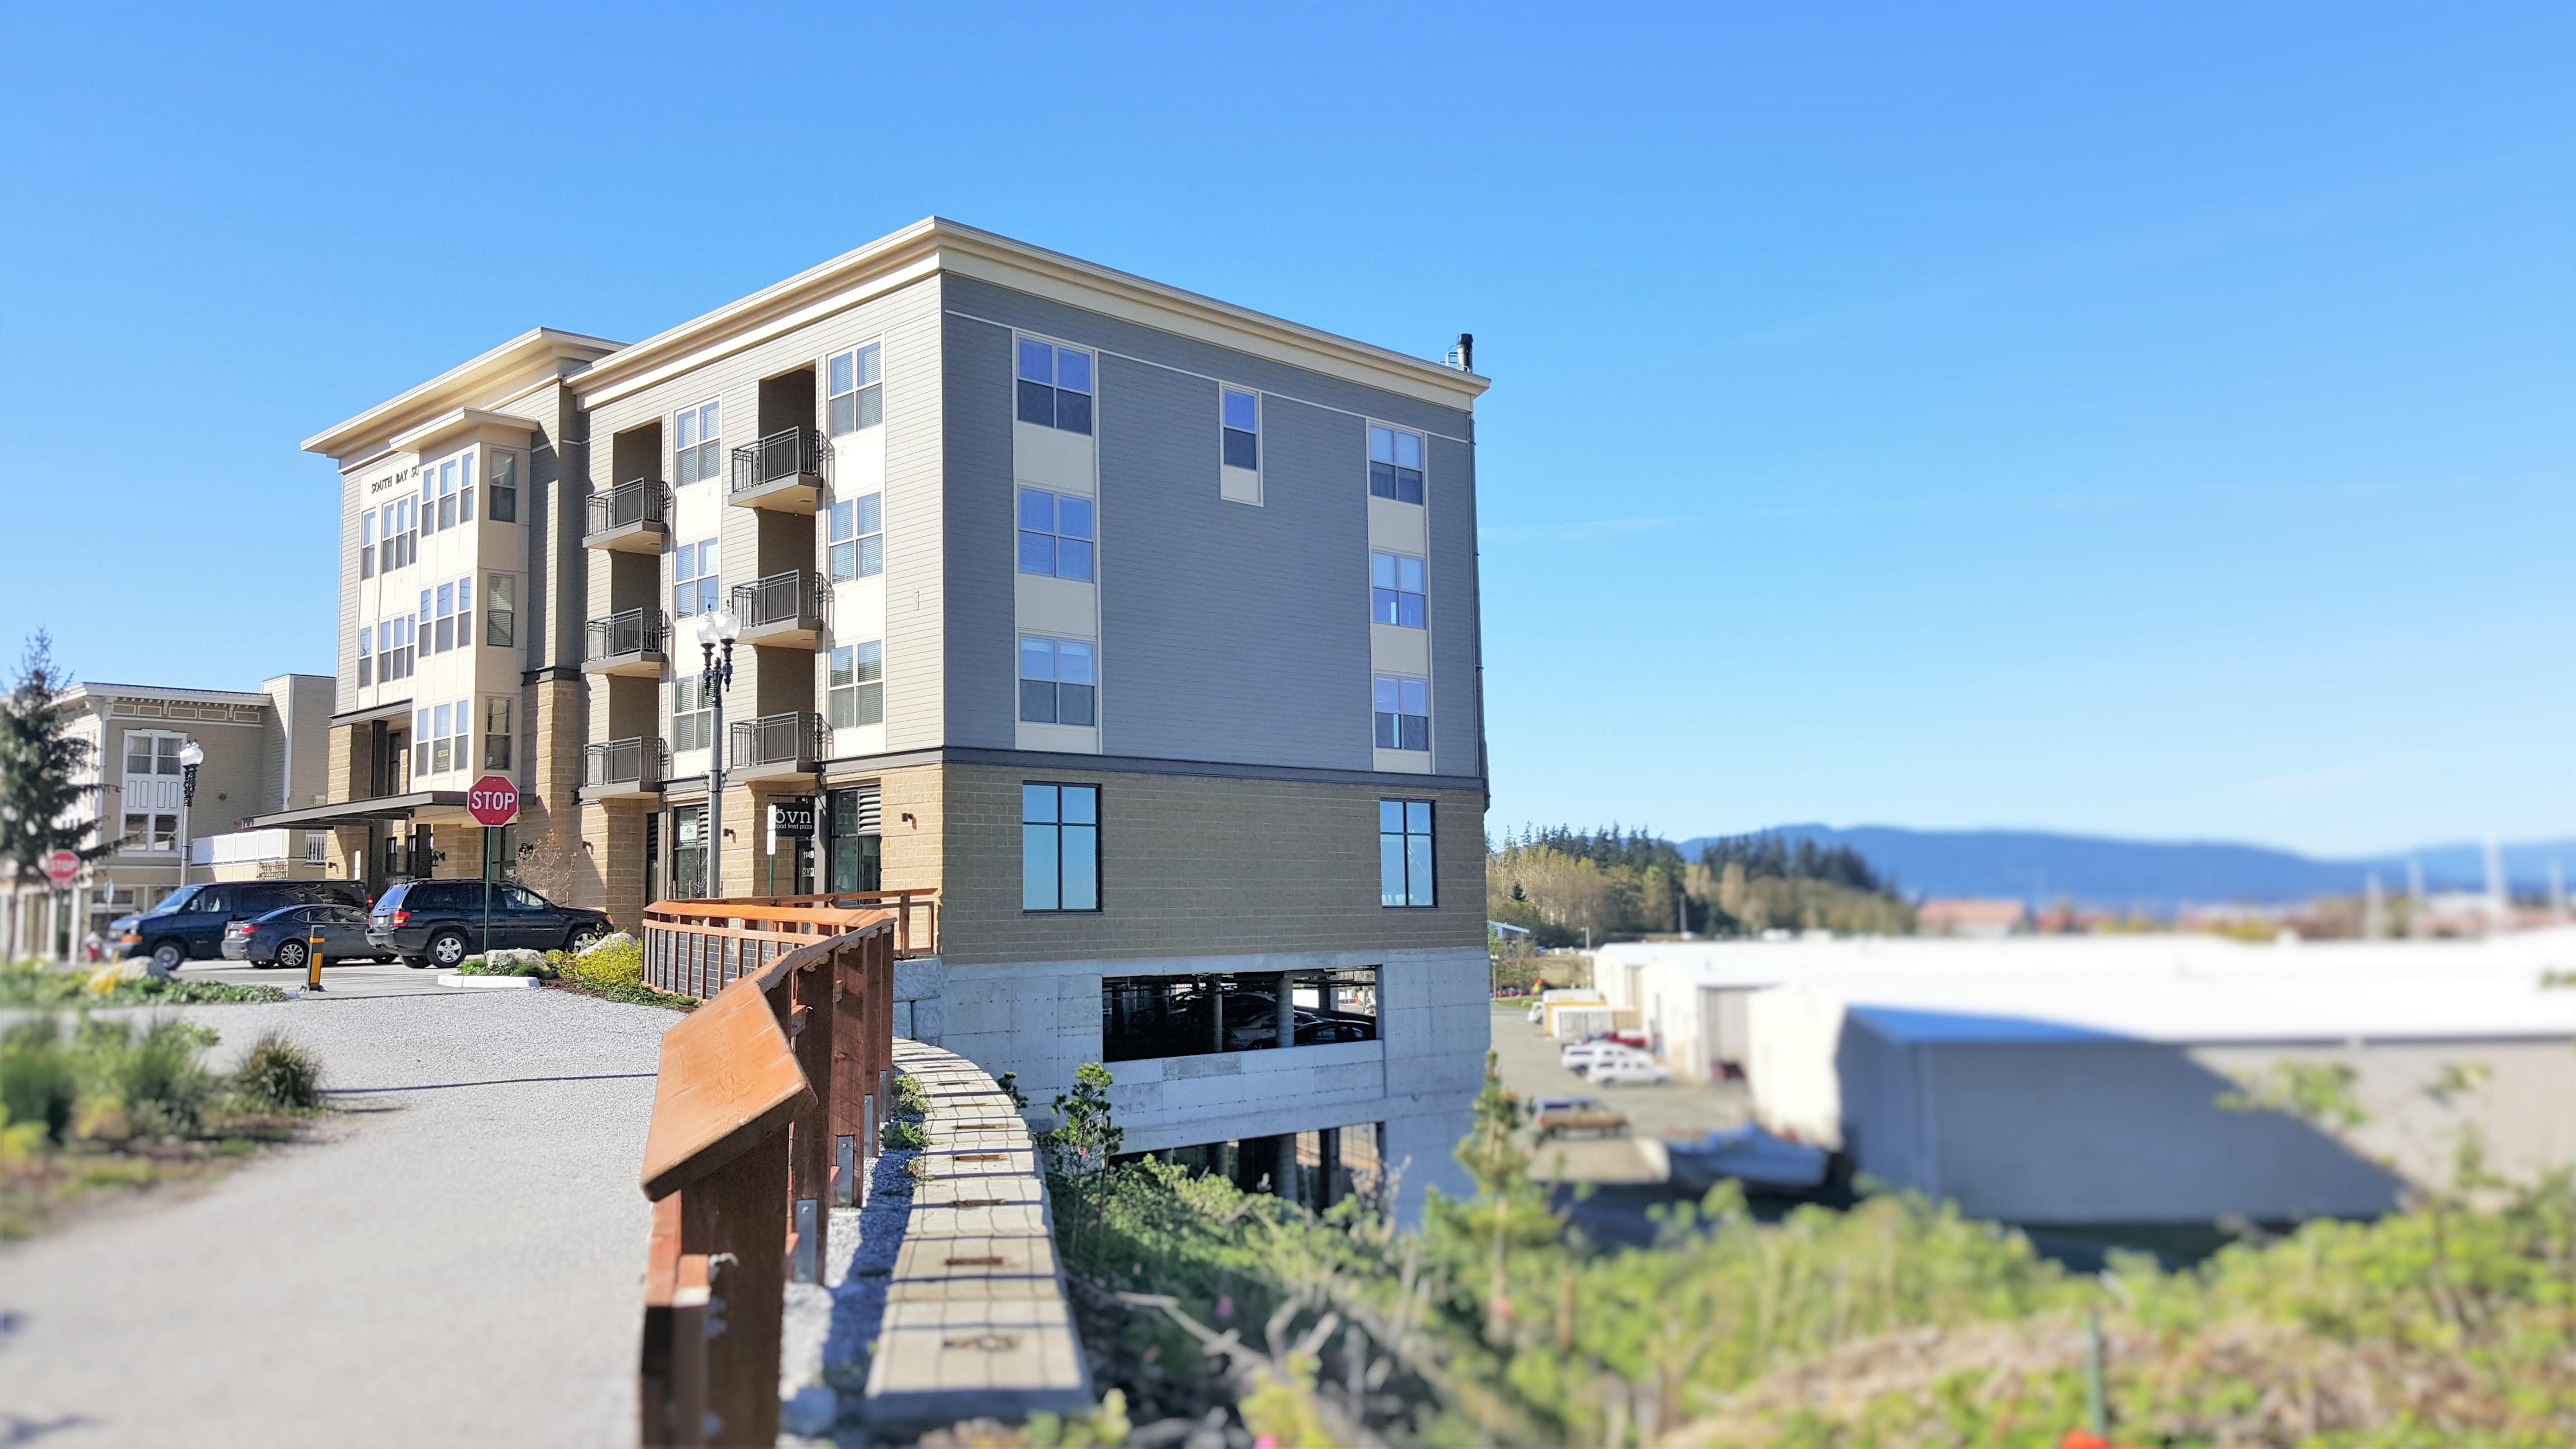 South Bay Suites 4